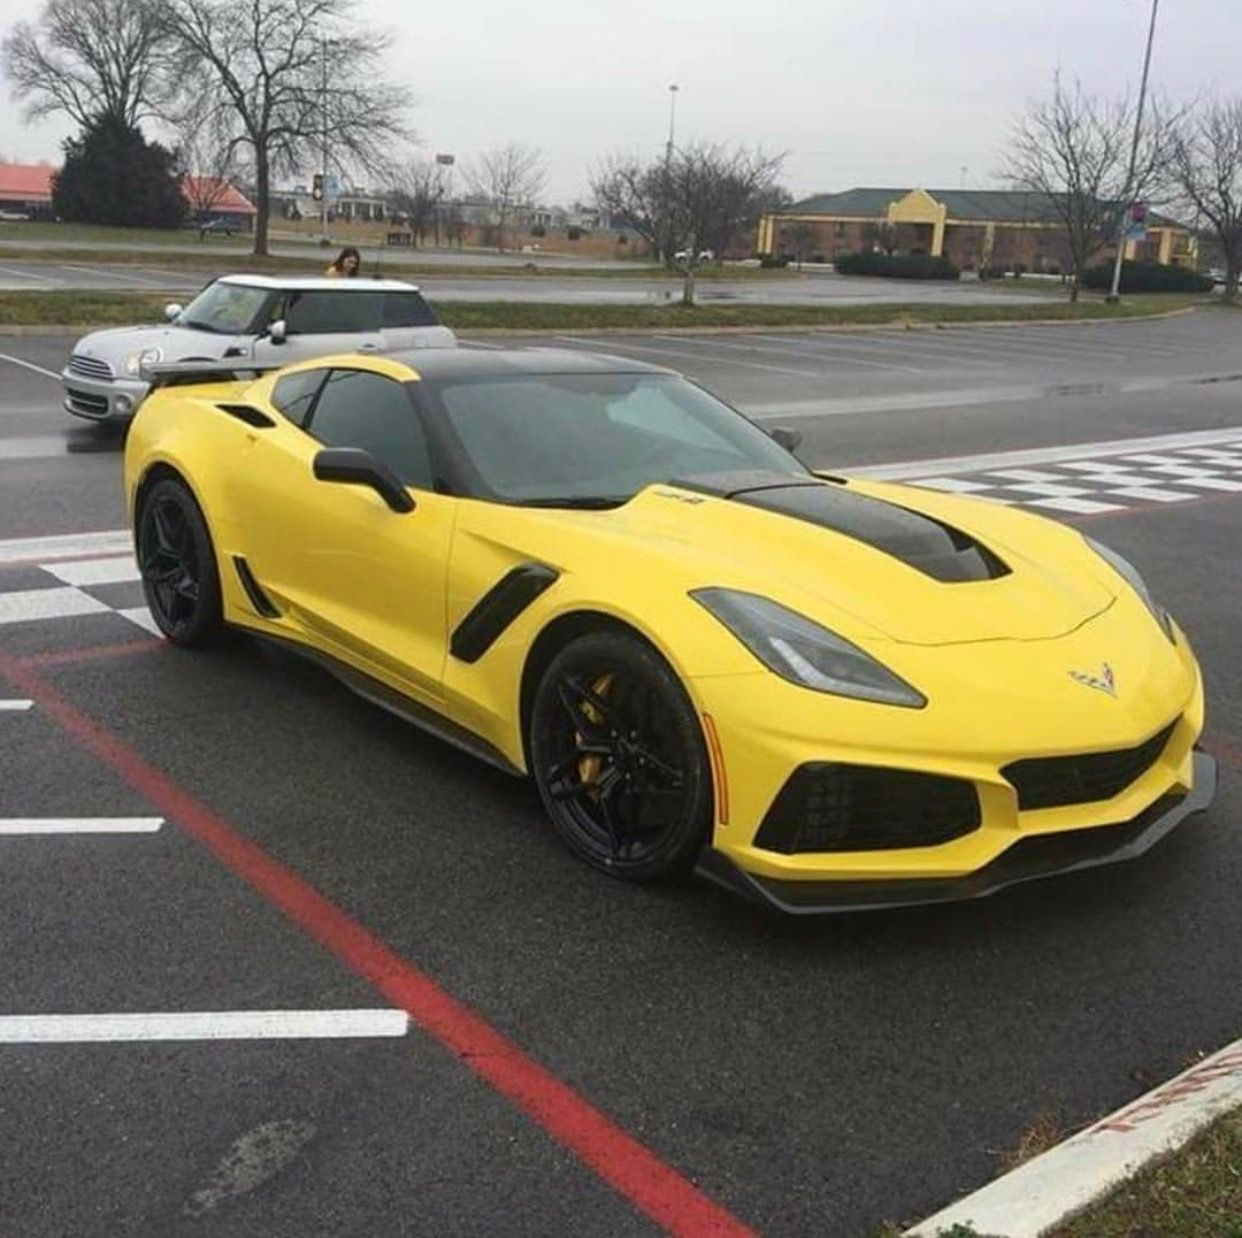 Chevrolet Corvette C7 Zr1 Painted In Corvette Racing Yellow Photo